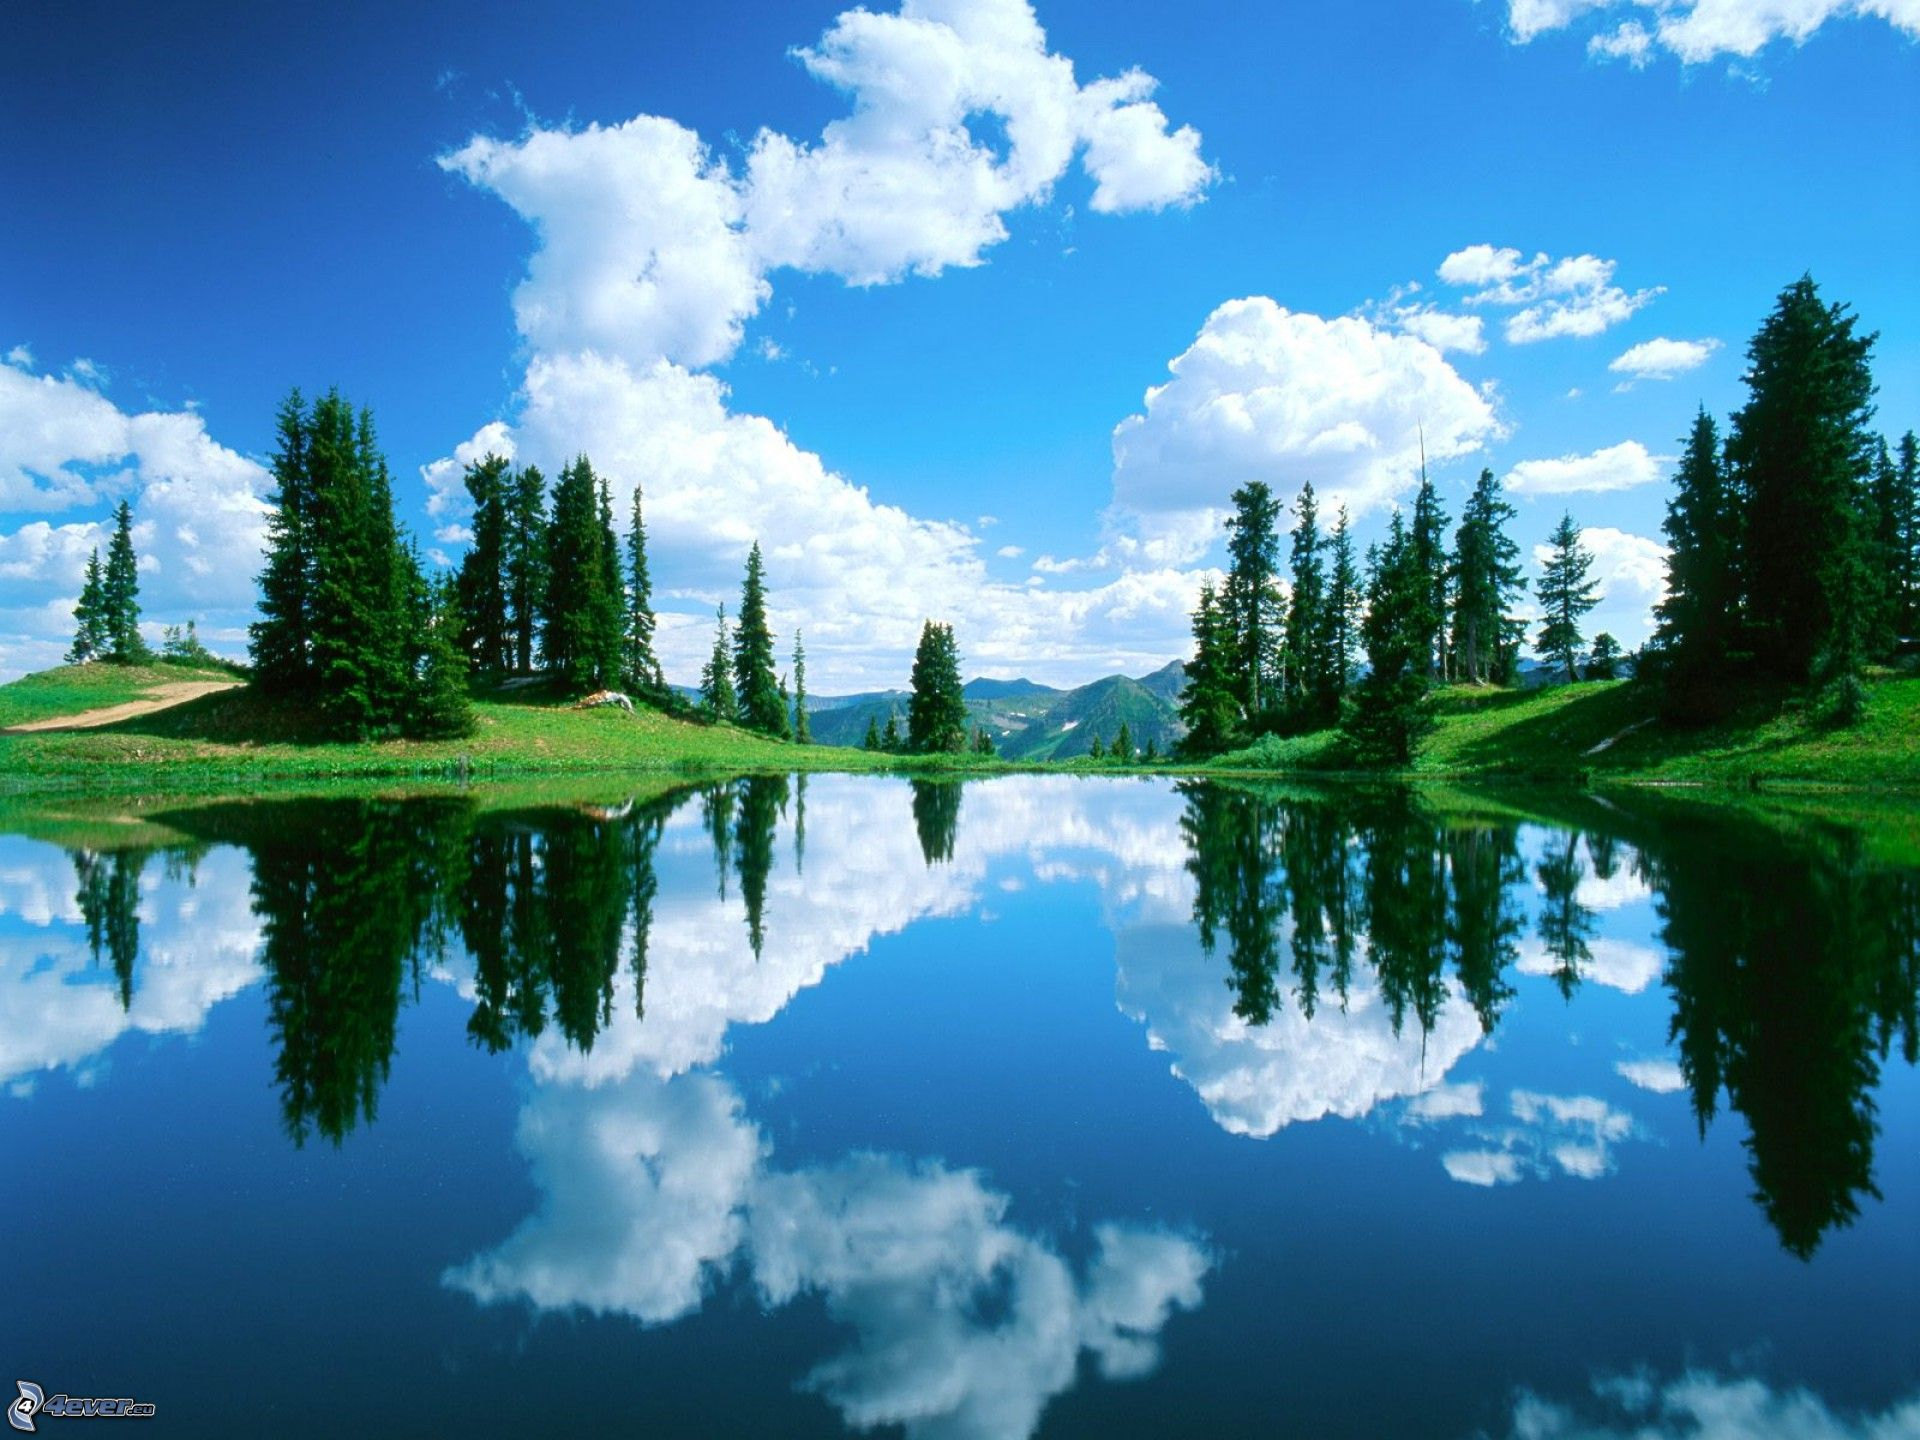 sky blue mountain reflection - photo #42